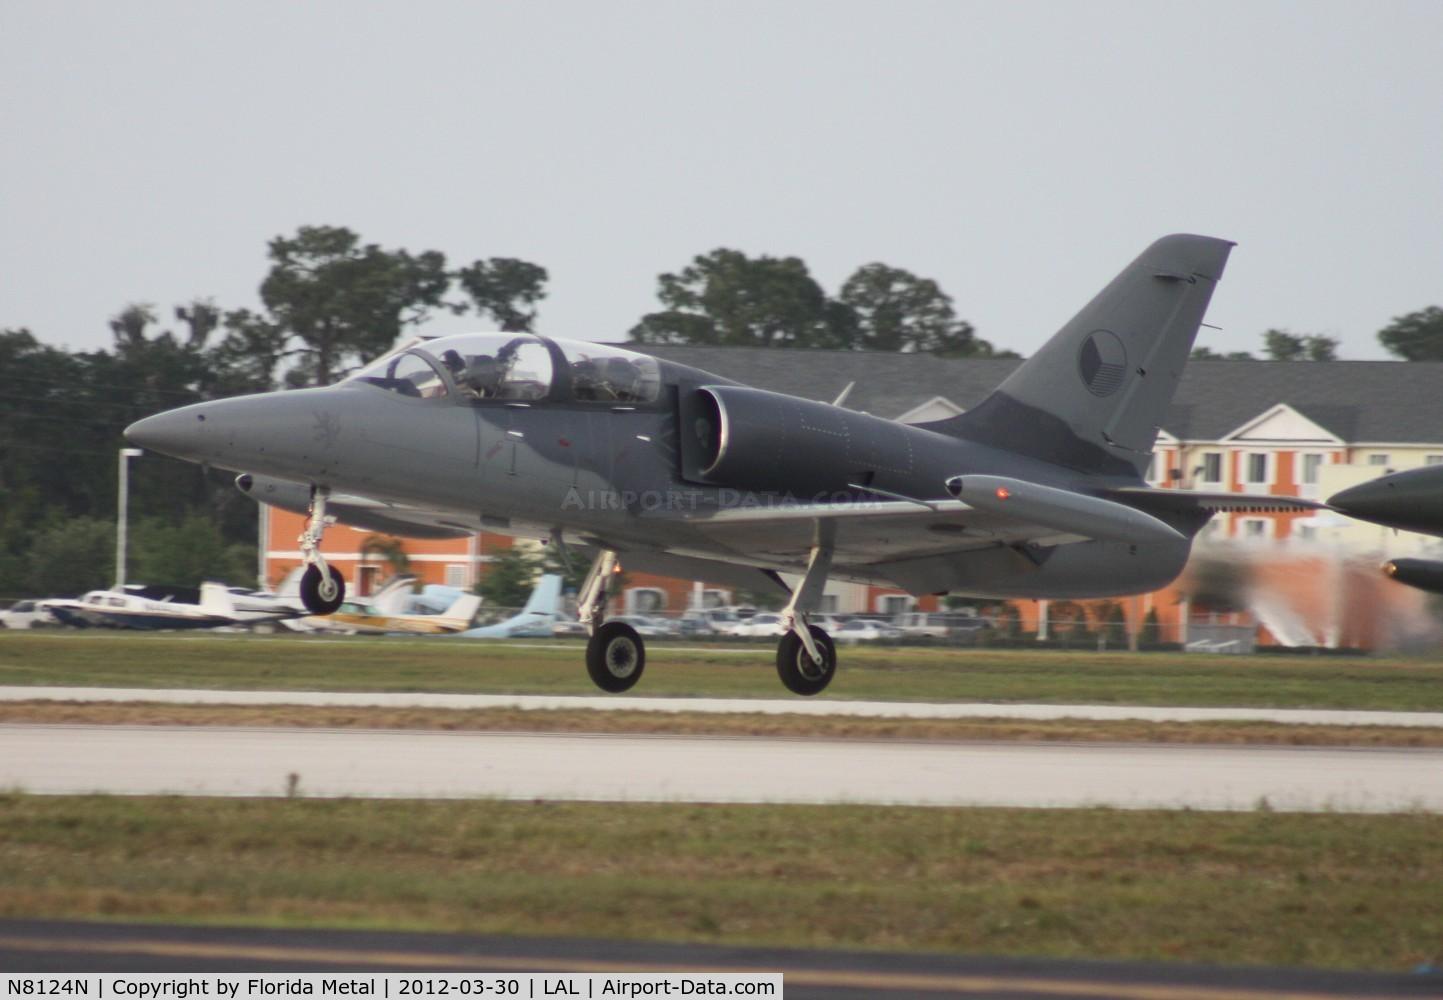 N8124N, 1974 Aero L-39C Albatros C/N 330211, L39 Albatross